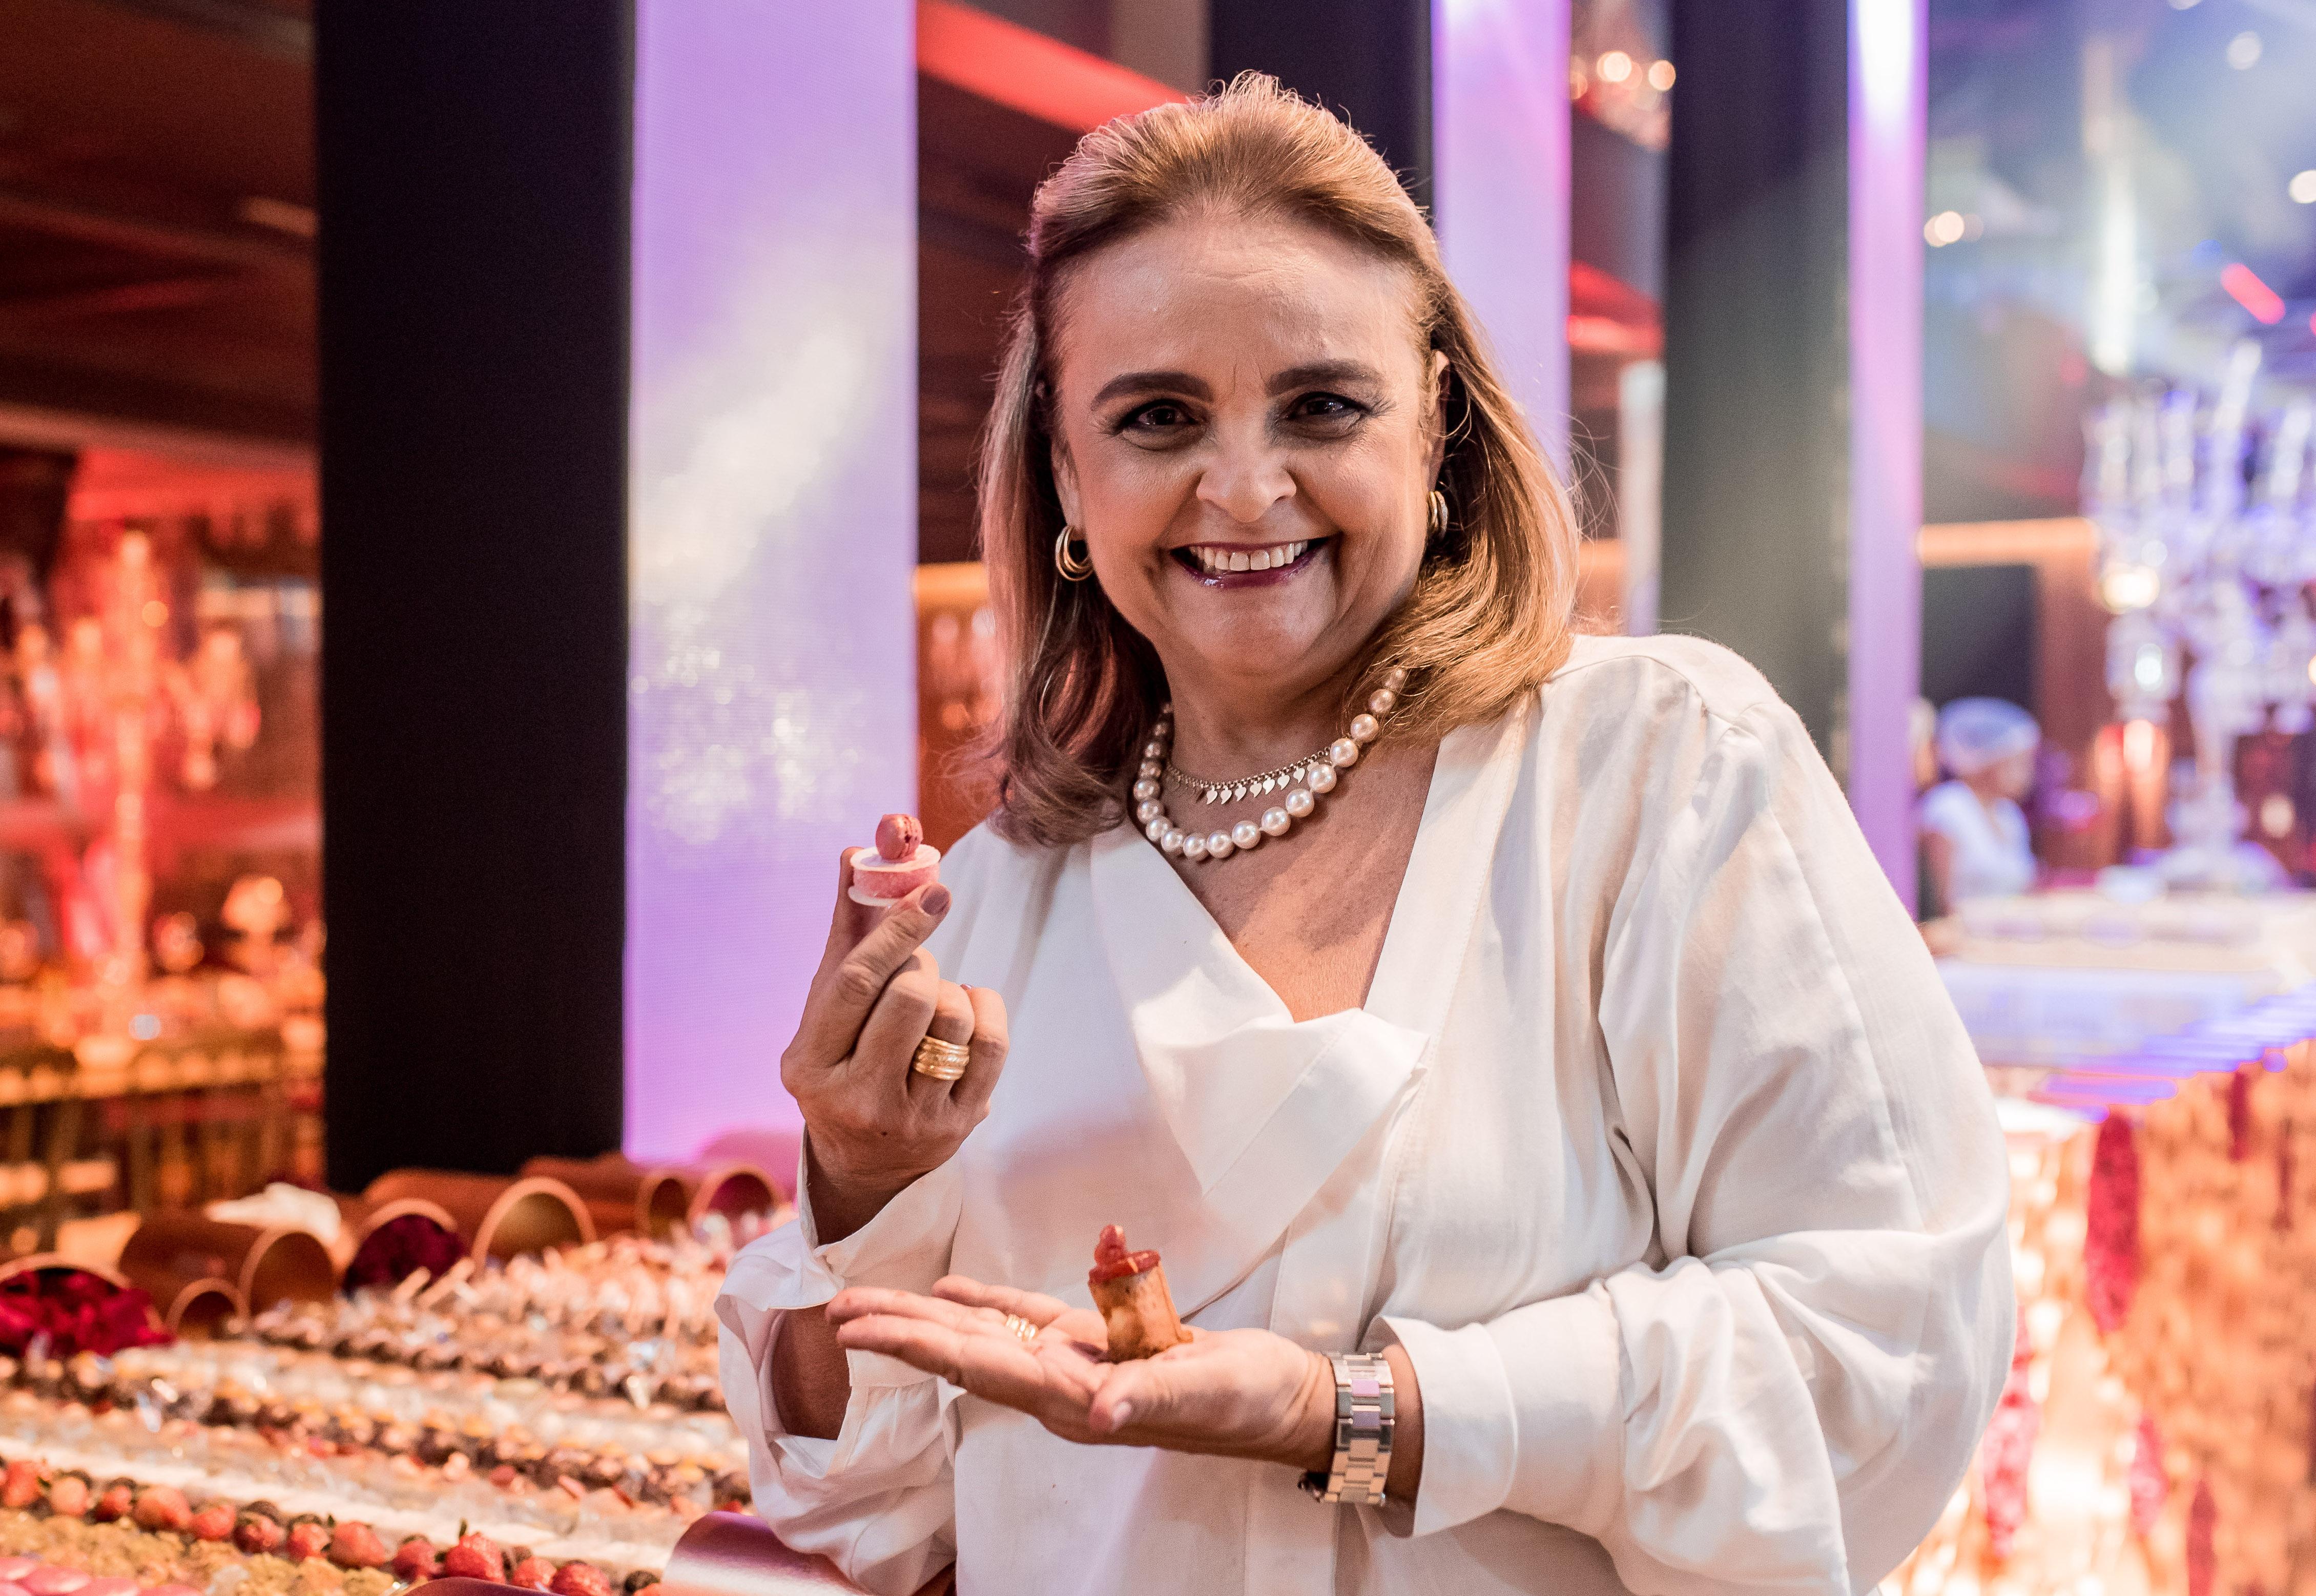 O que será que Toca Couto prepara para o casamento de Nicole Vasconcelos e Pedro Paulo Carapeba